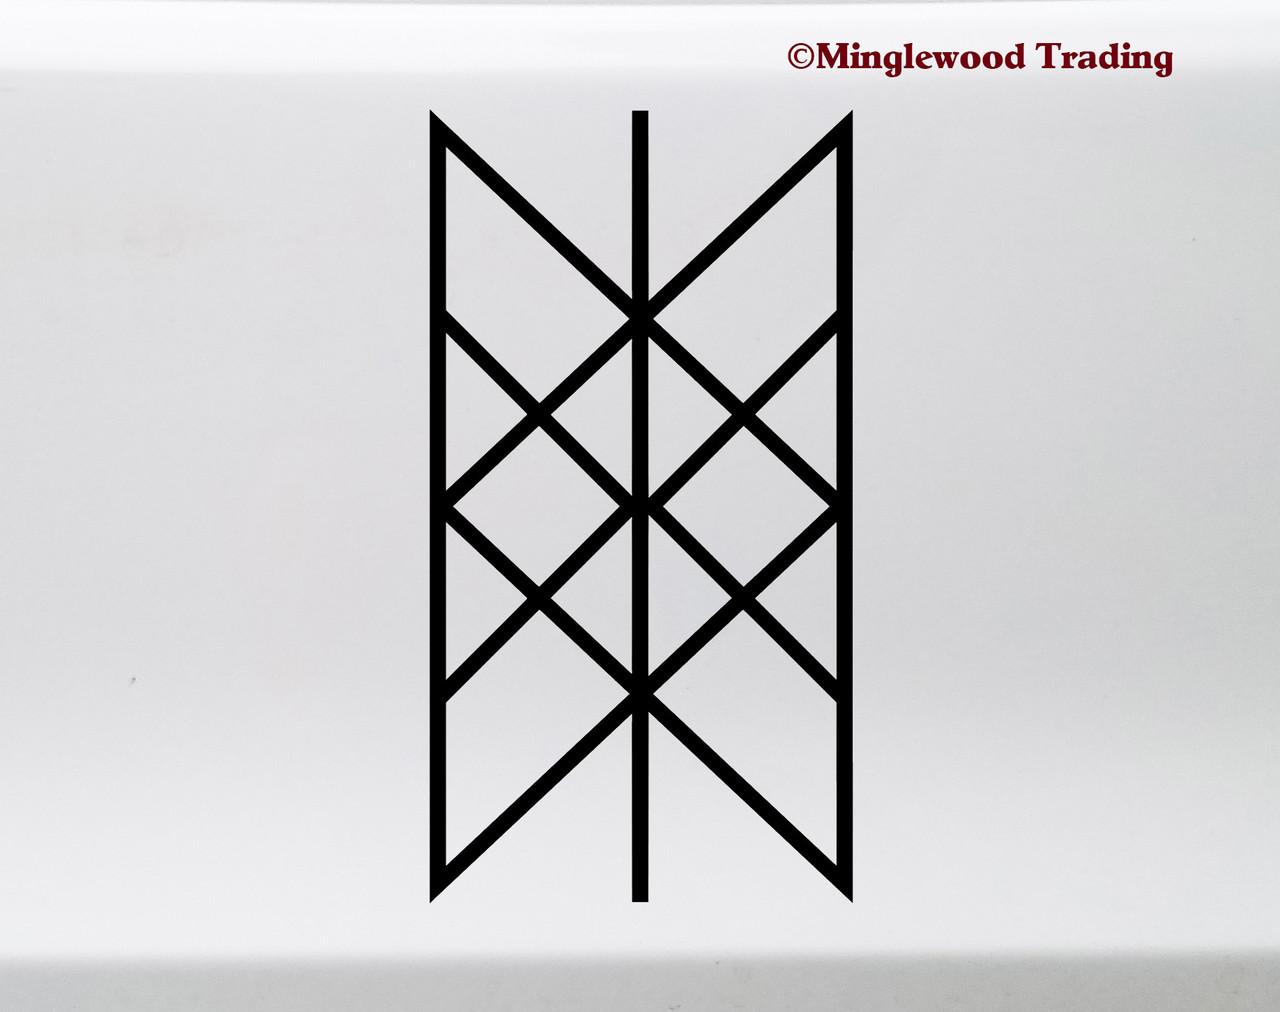 Web of Wyrd Vinyl Sticker - Viking Matrix of Fate Skuld's Net Symbol - Die Cut Decal